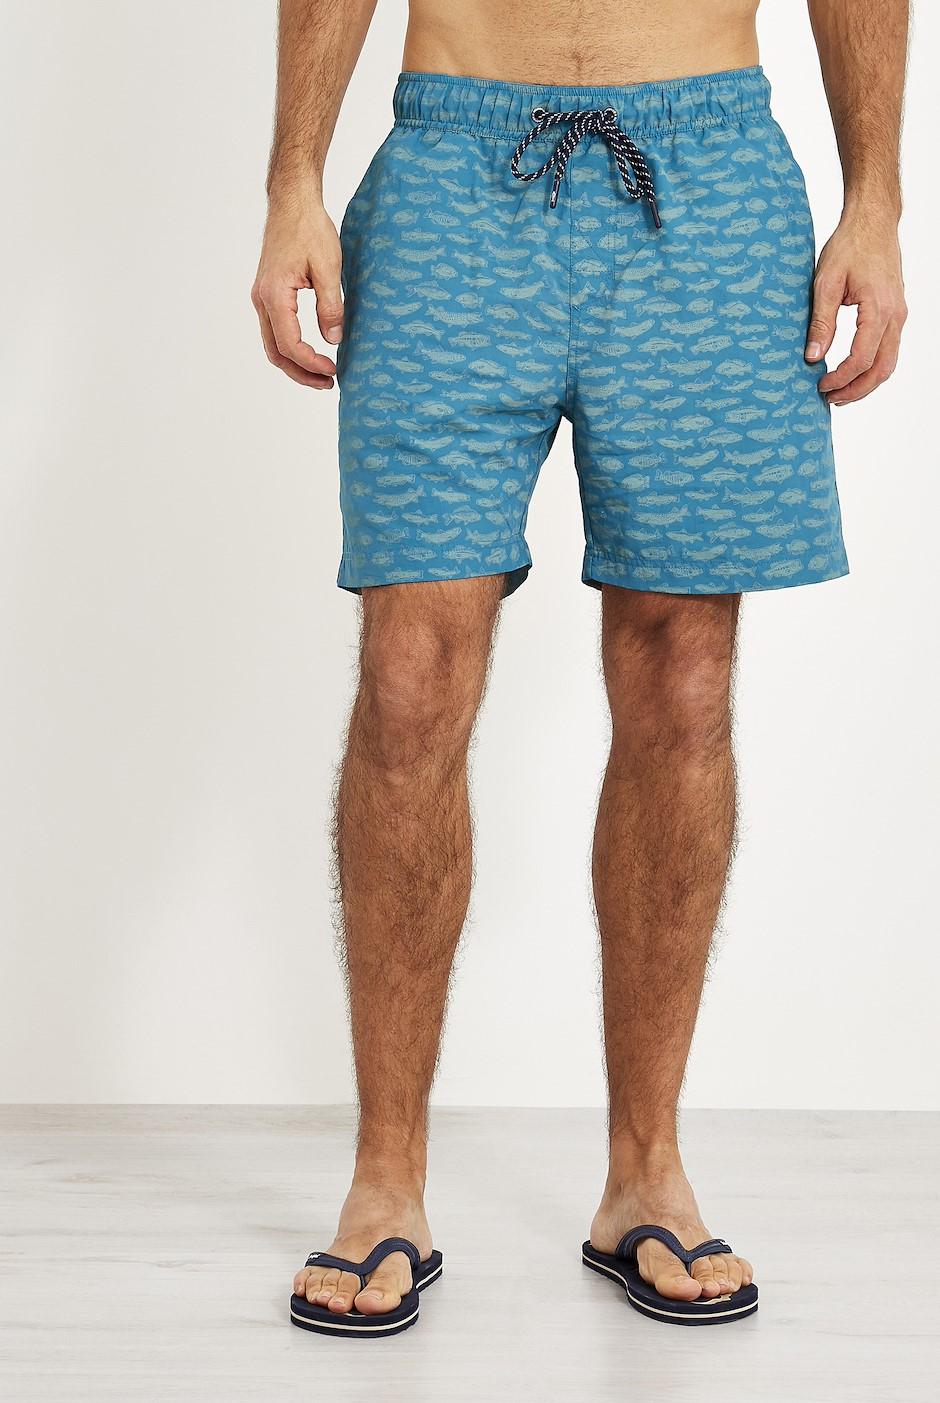 Barona Printed Board Shorts Harbour blue